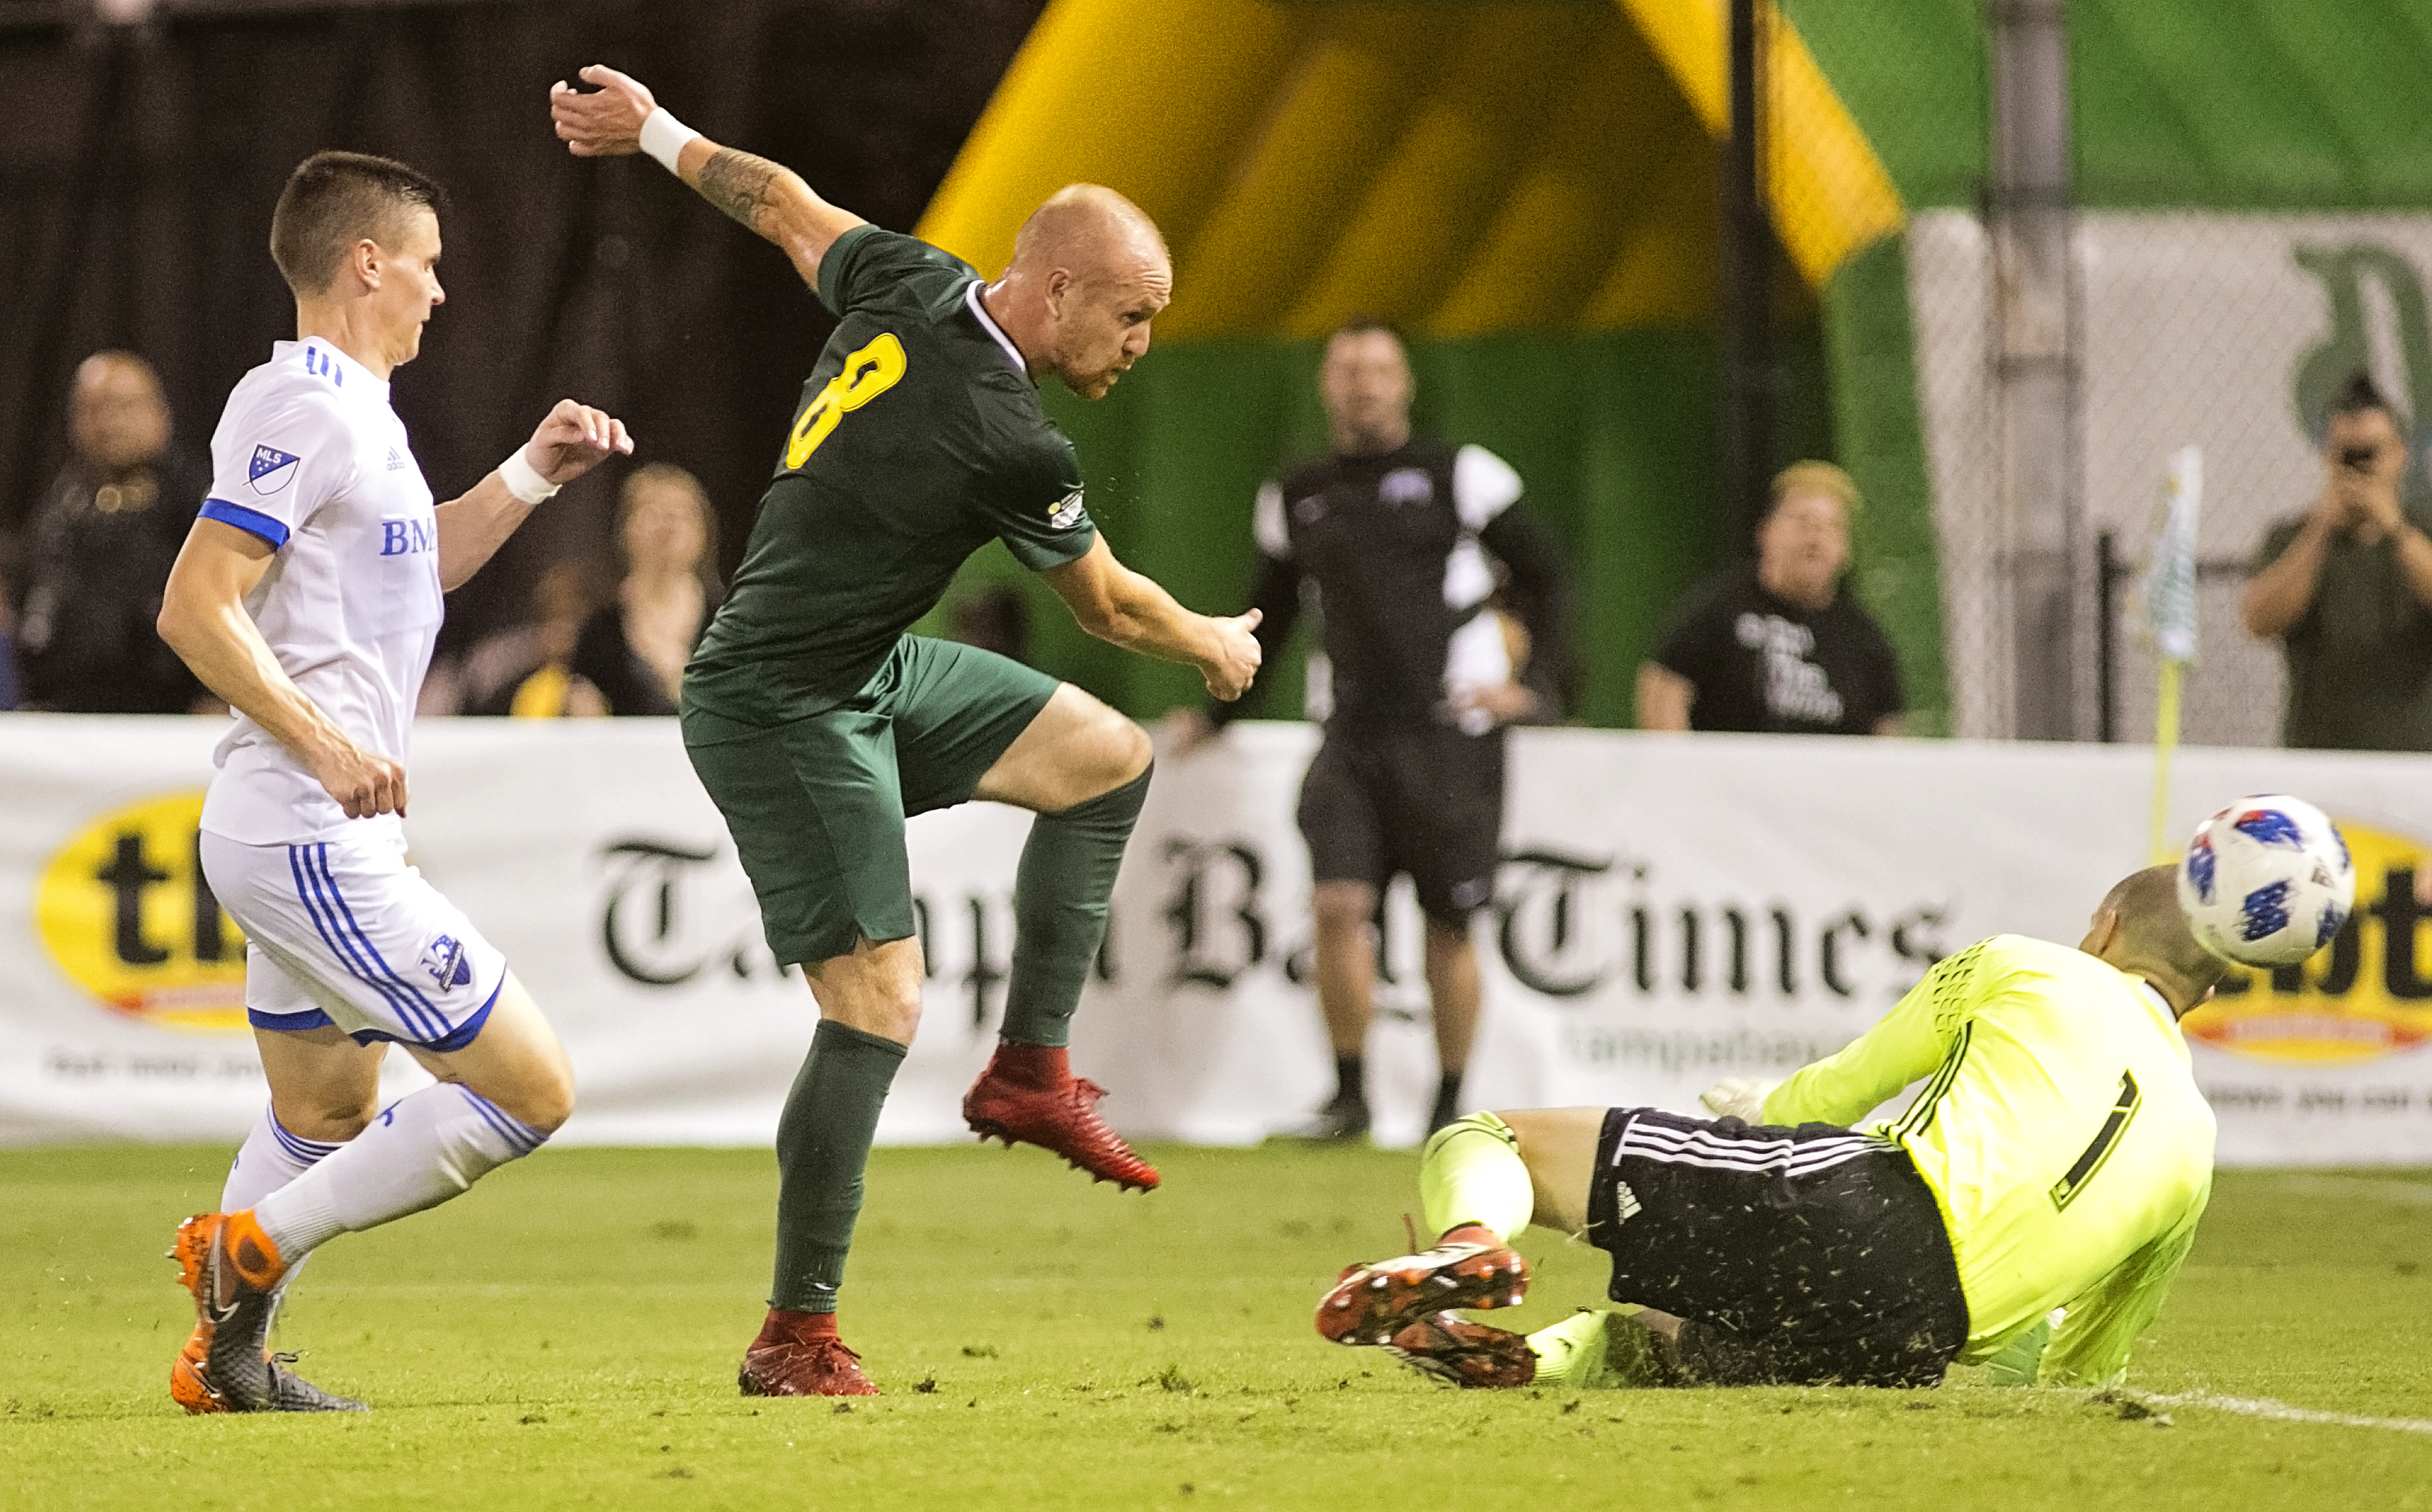 Jochen Graf goes airborne to score the first Rowdies goal./CARMEN MANDATO